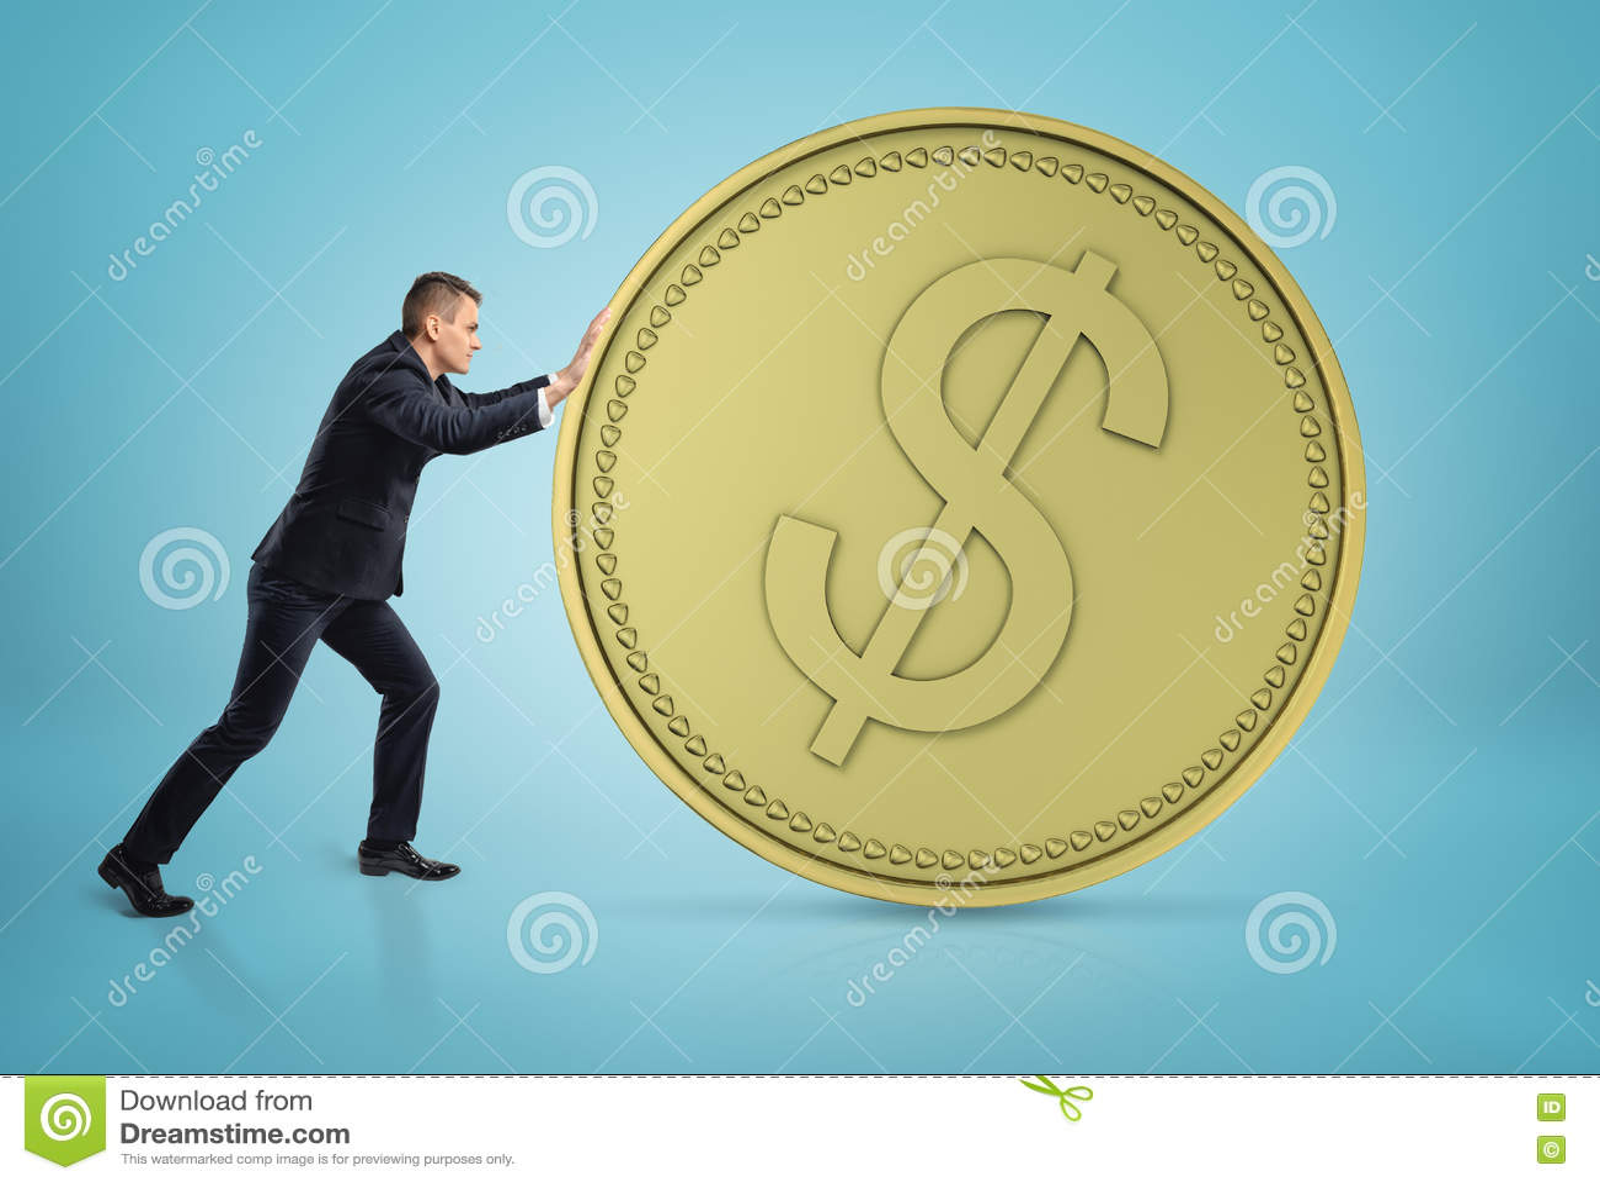 Families managing money in hard economic